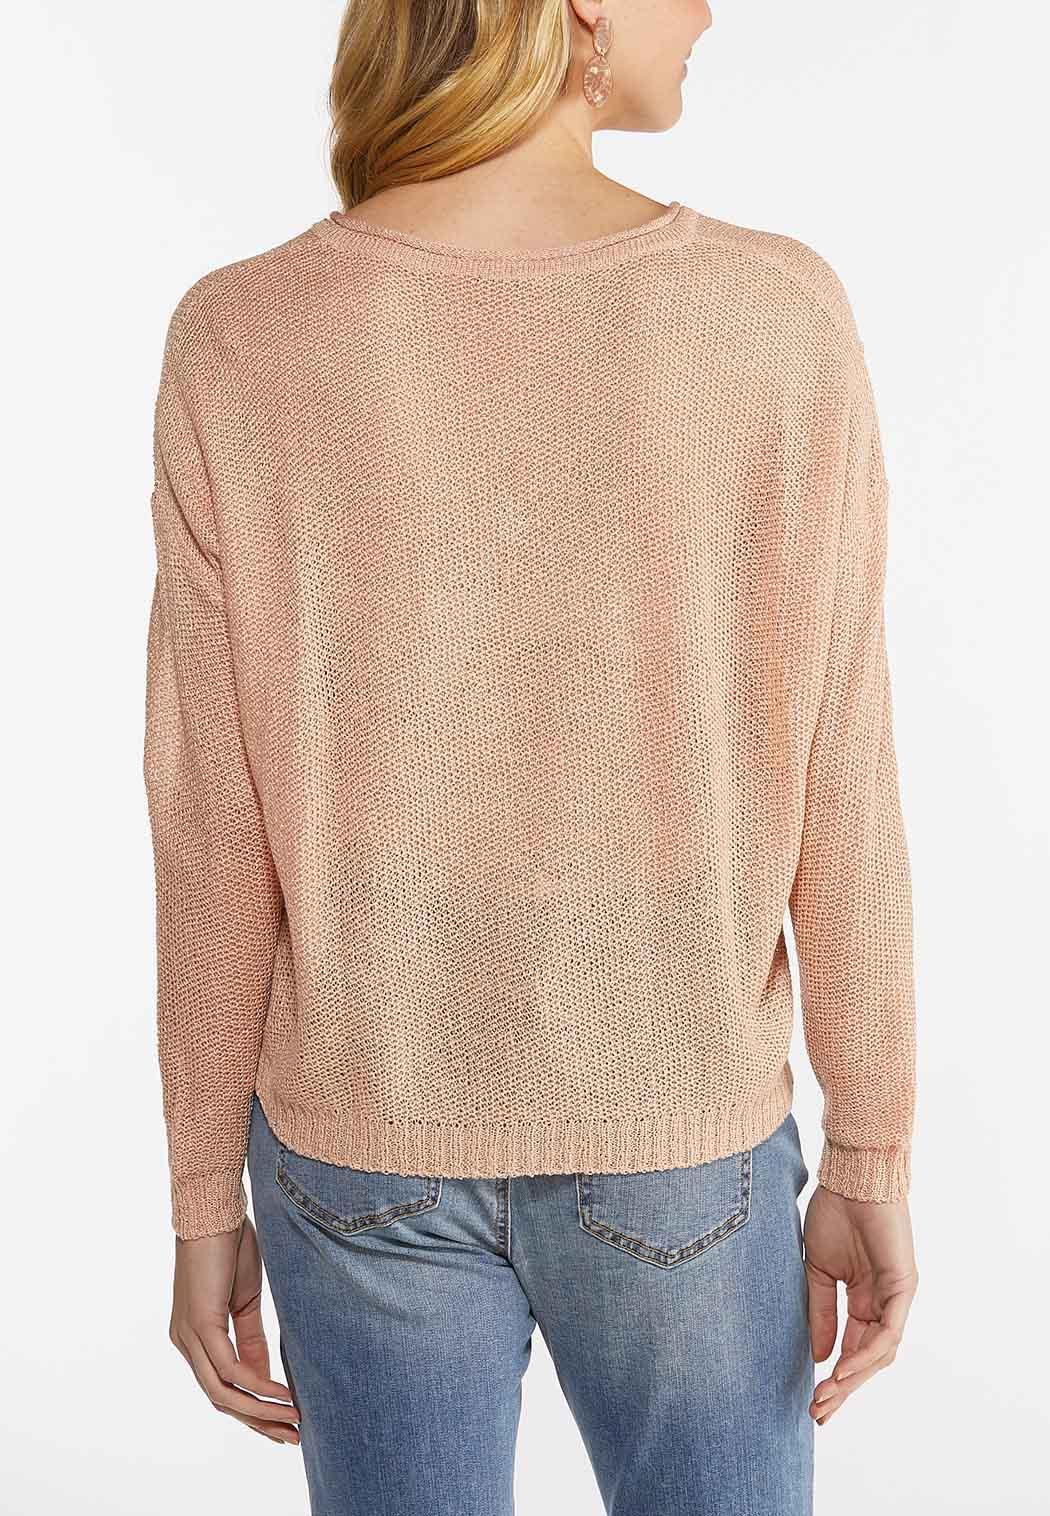 Blush V-Neck Sweater (Item #44492129)